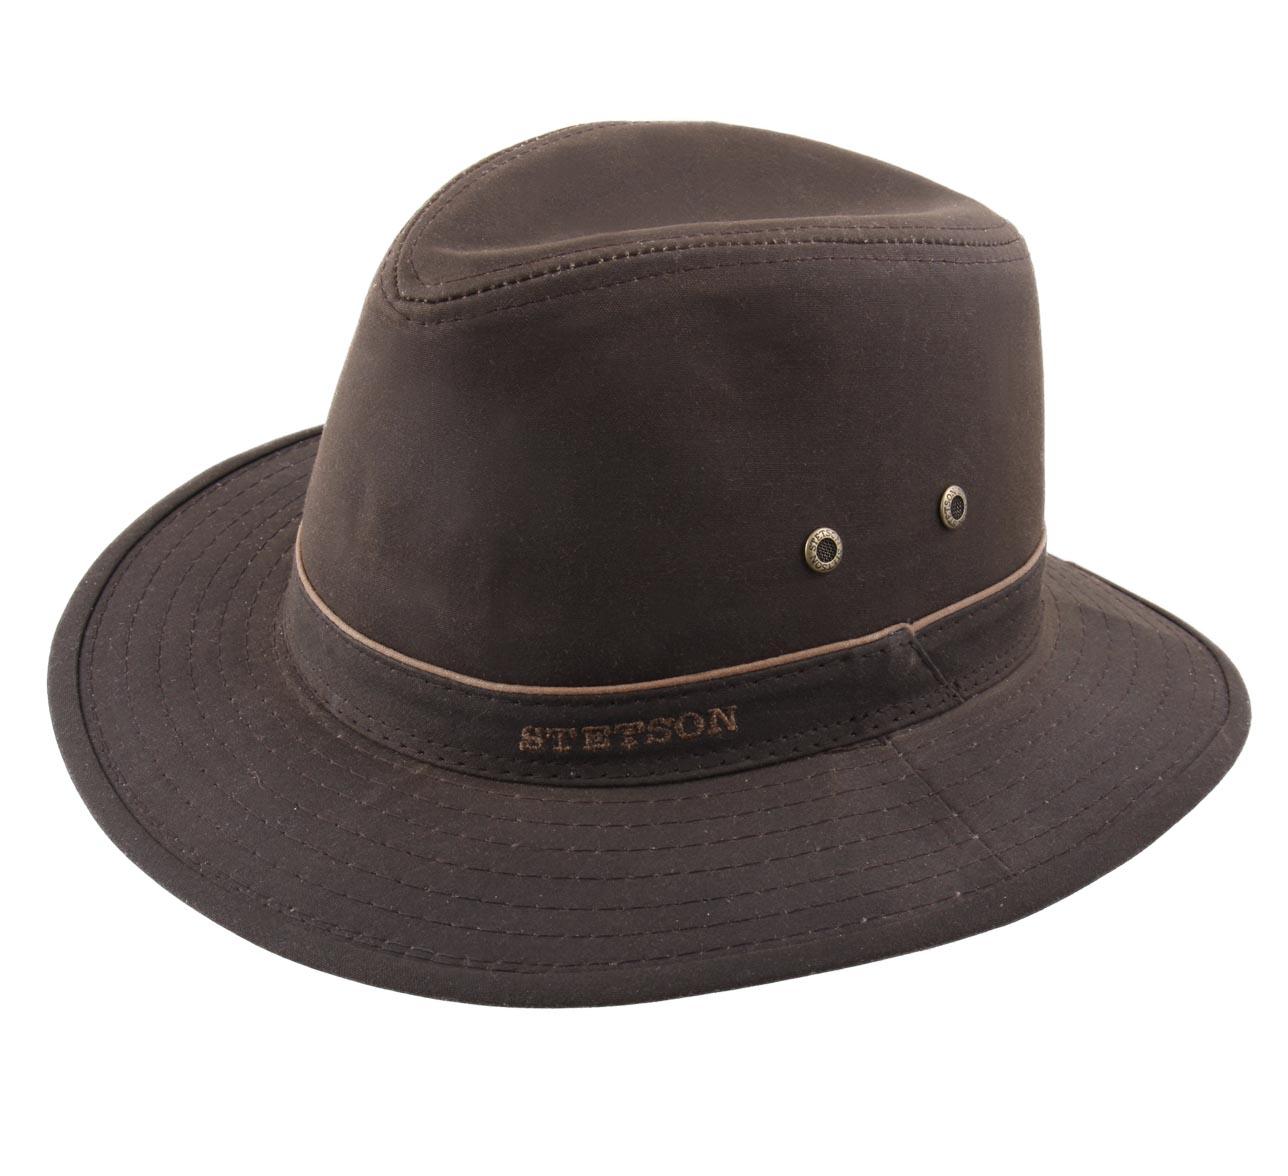 f4e95f5f65d Traveller waxed coton - Hats Stetson